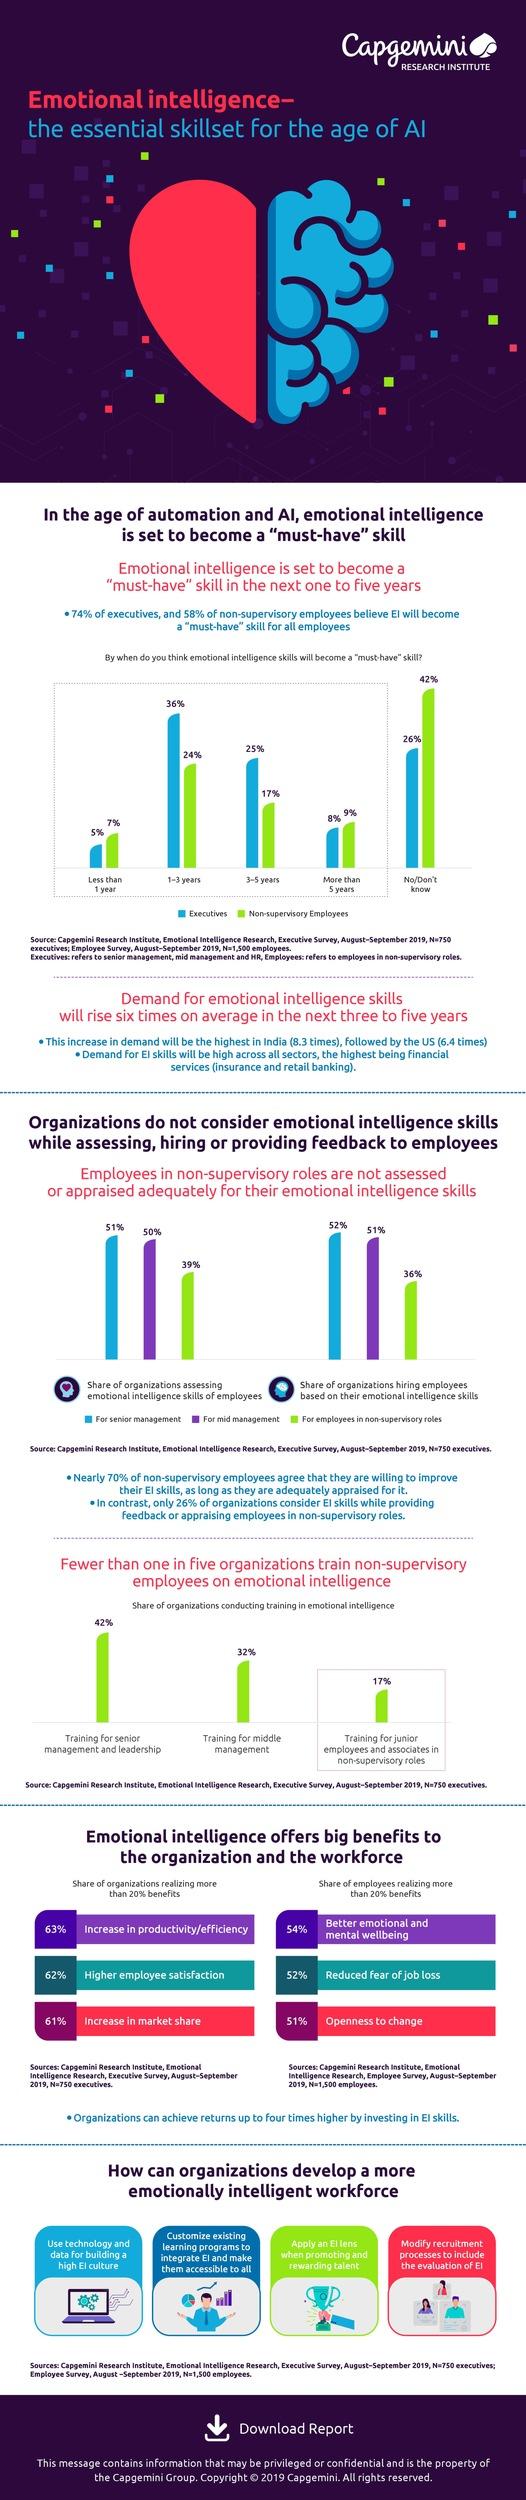 emotionalintelligence-infographic.jpg